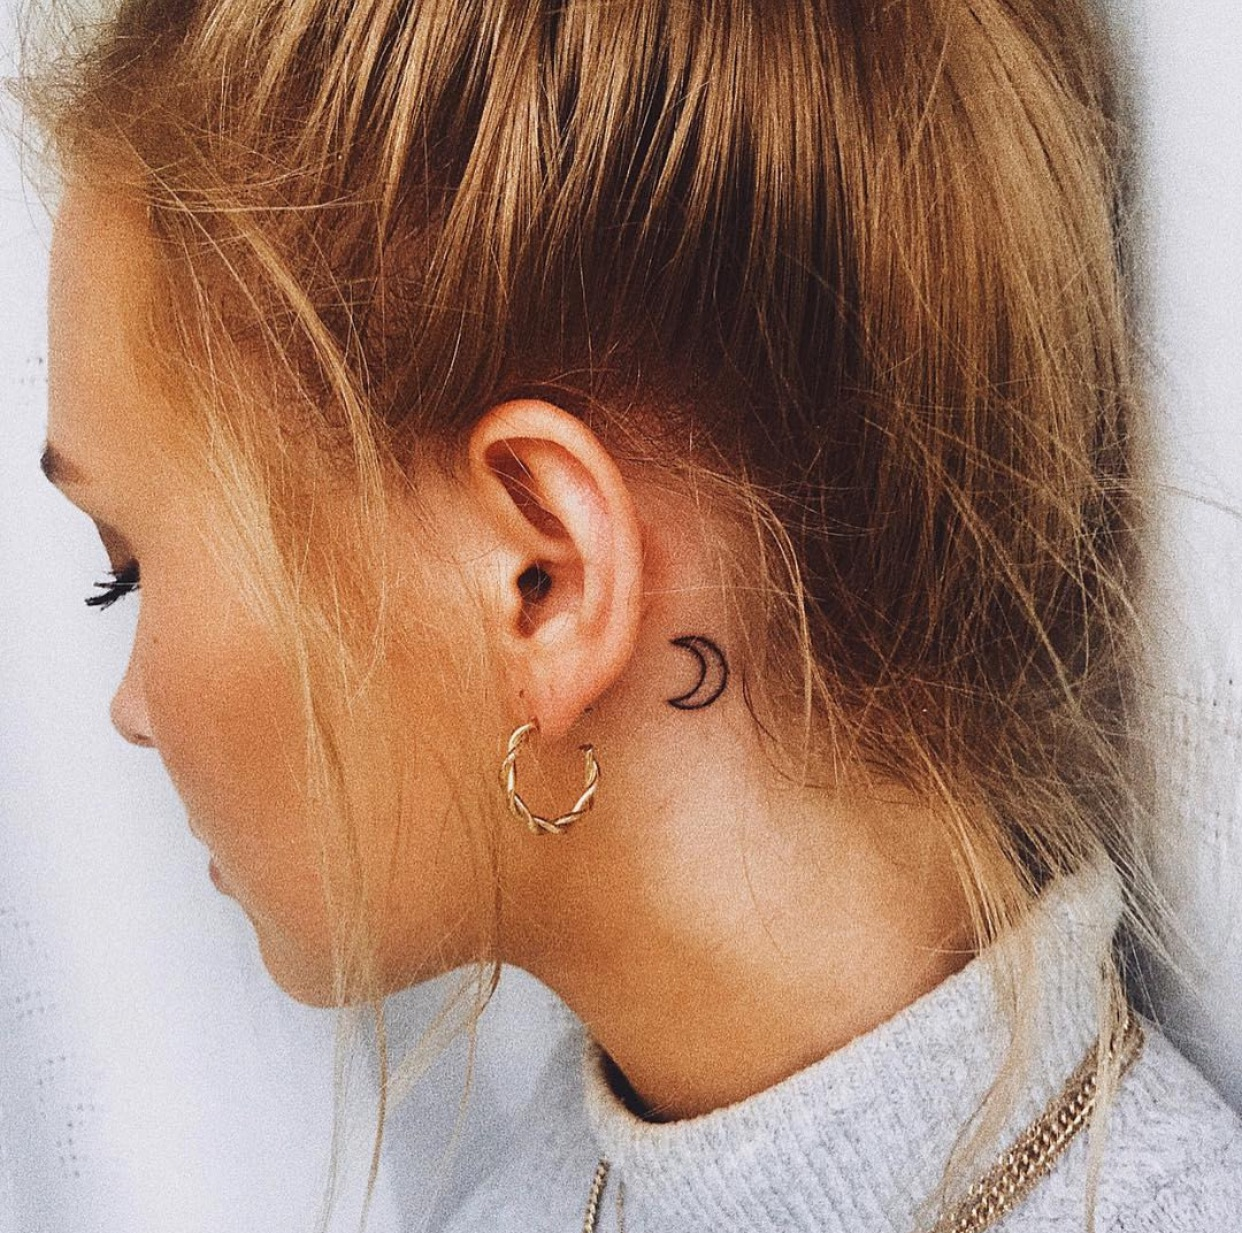 Татуировки за ухом фото 5